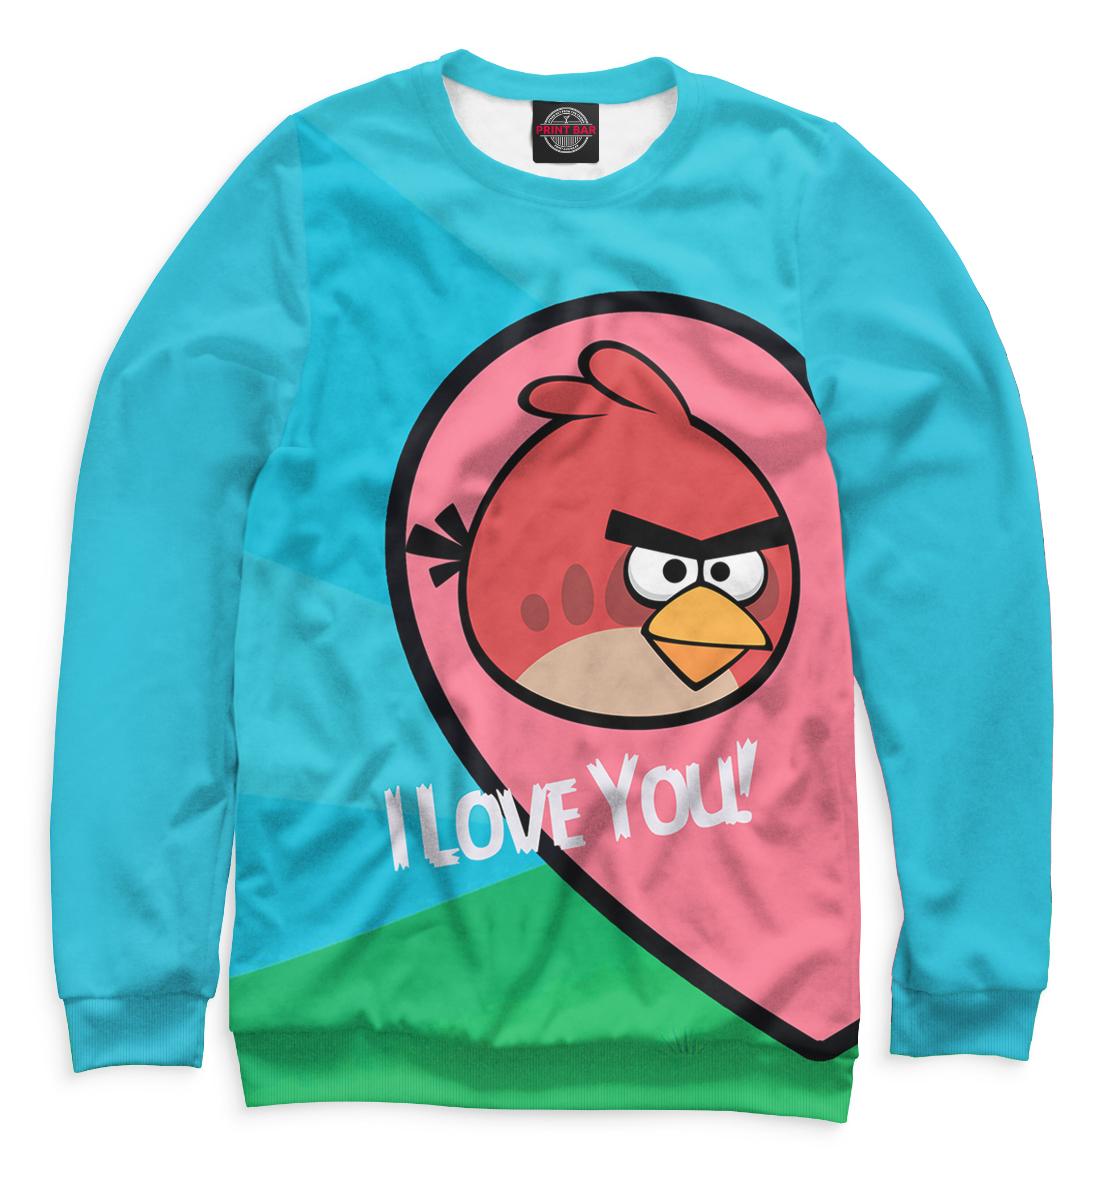 Купить Angry Birds in love, Printbar, Свитшоты, 14F-315750-swi-2